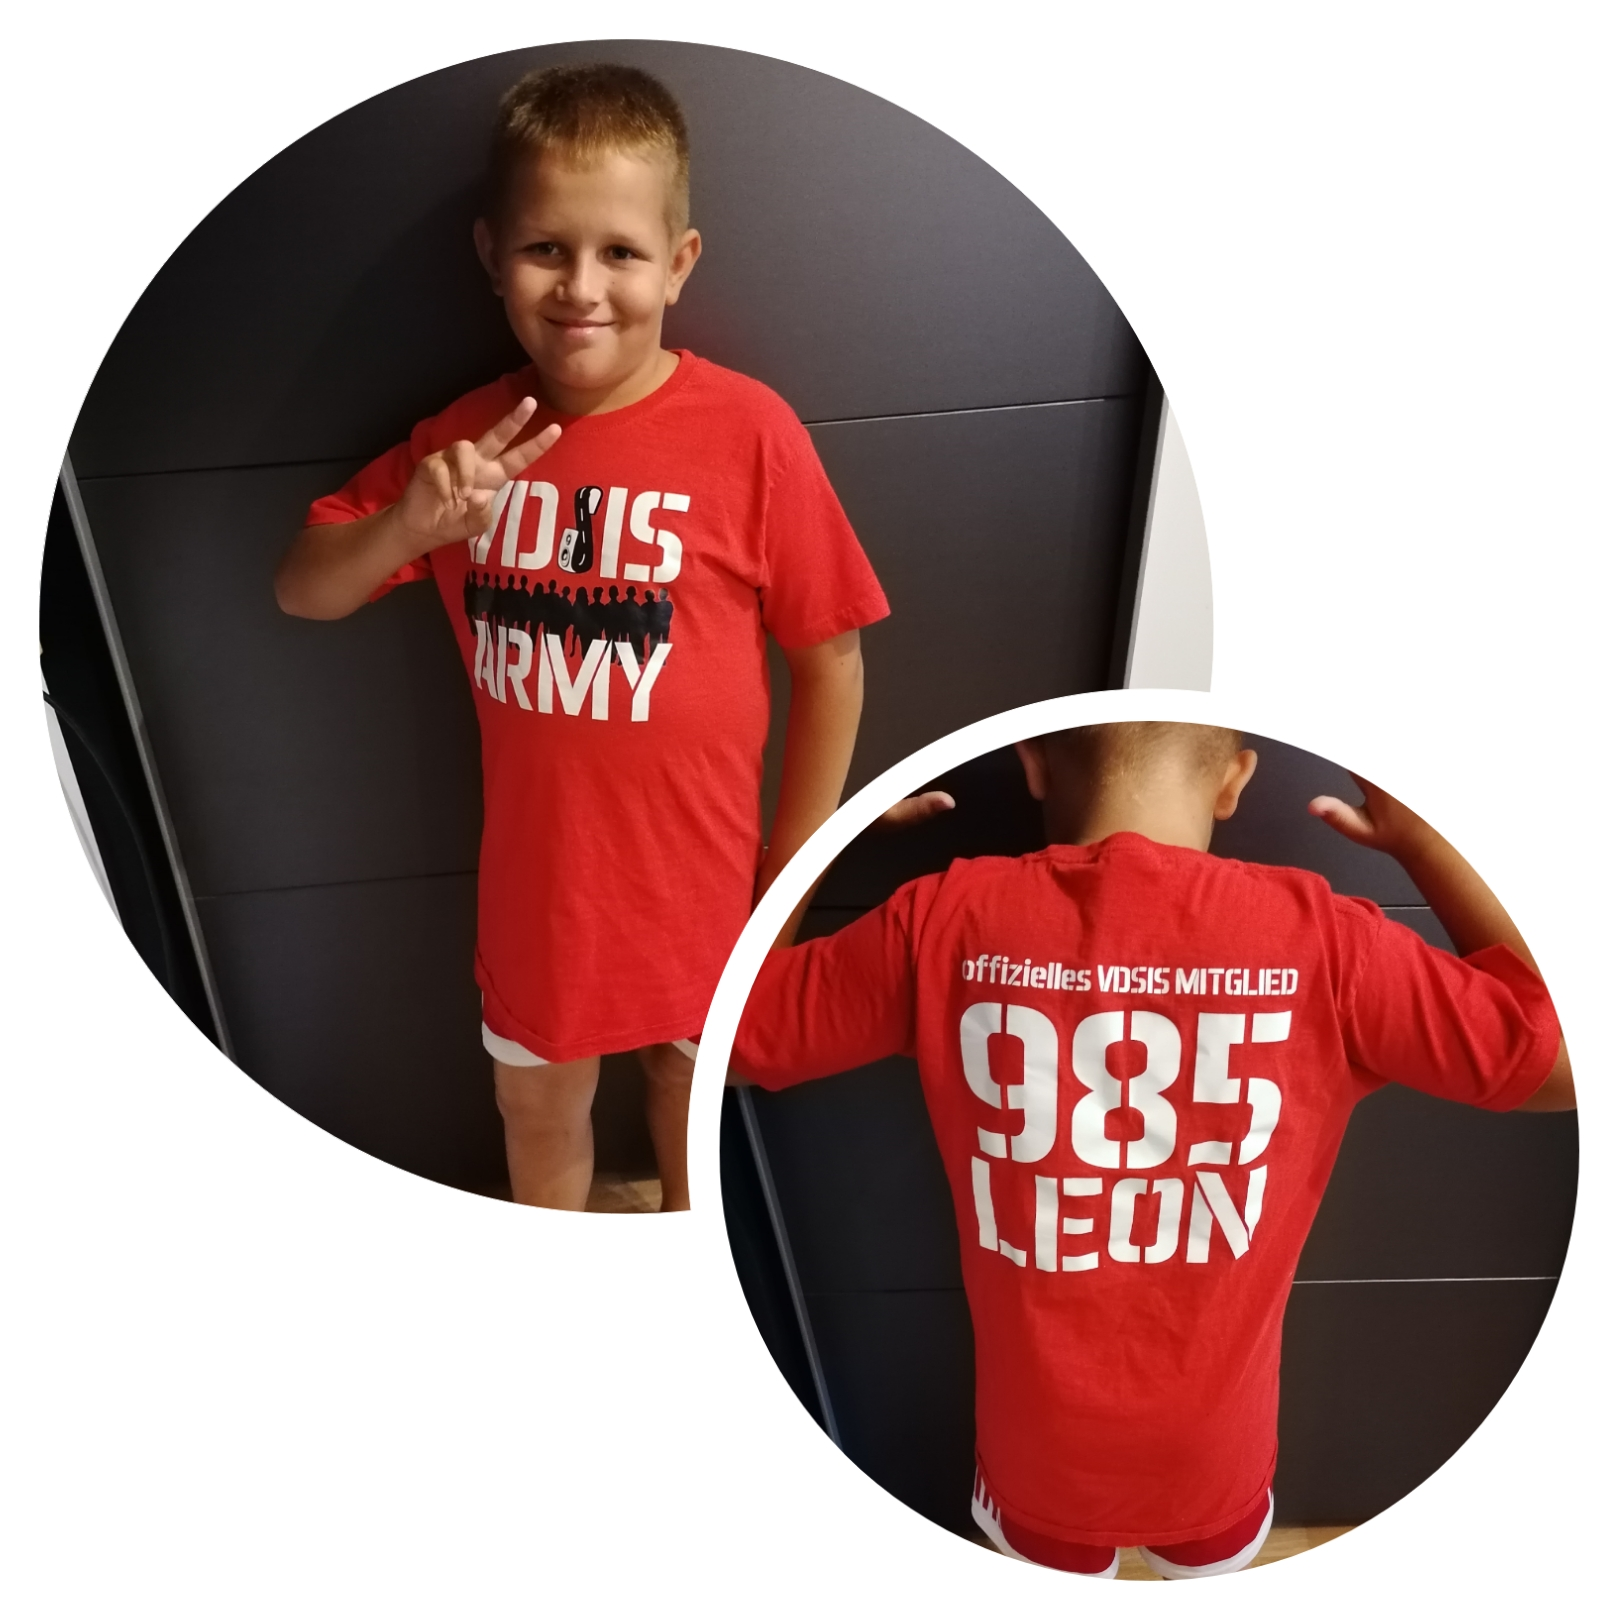 985 Leon vdsisarmy